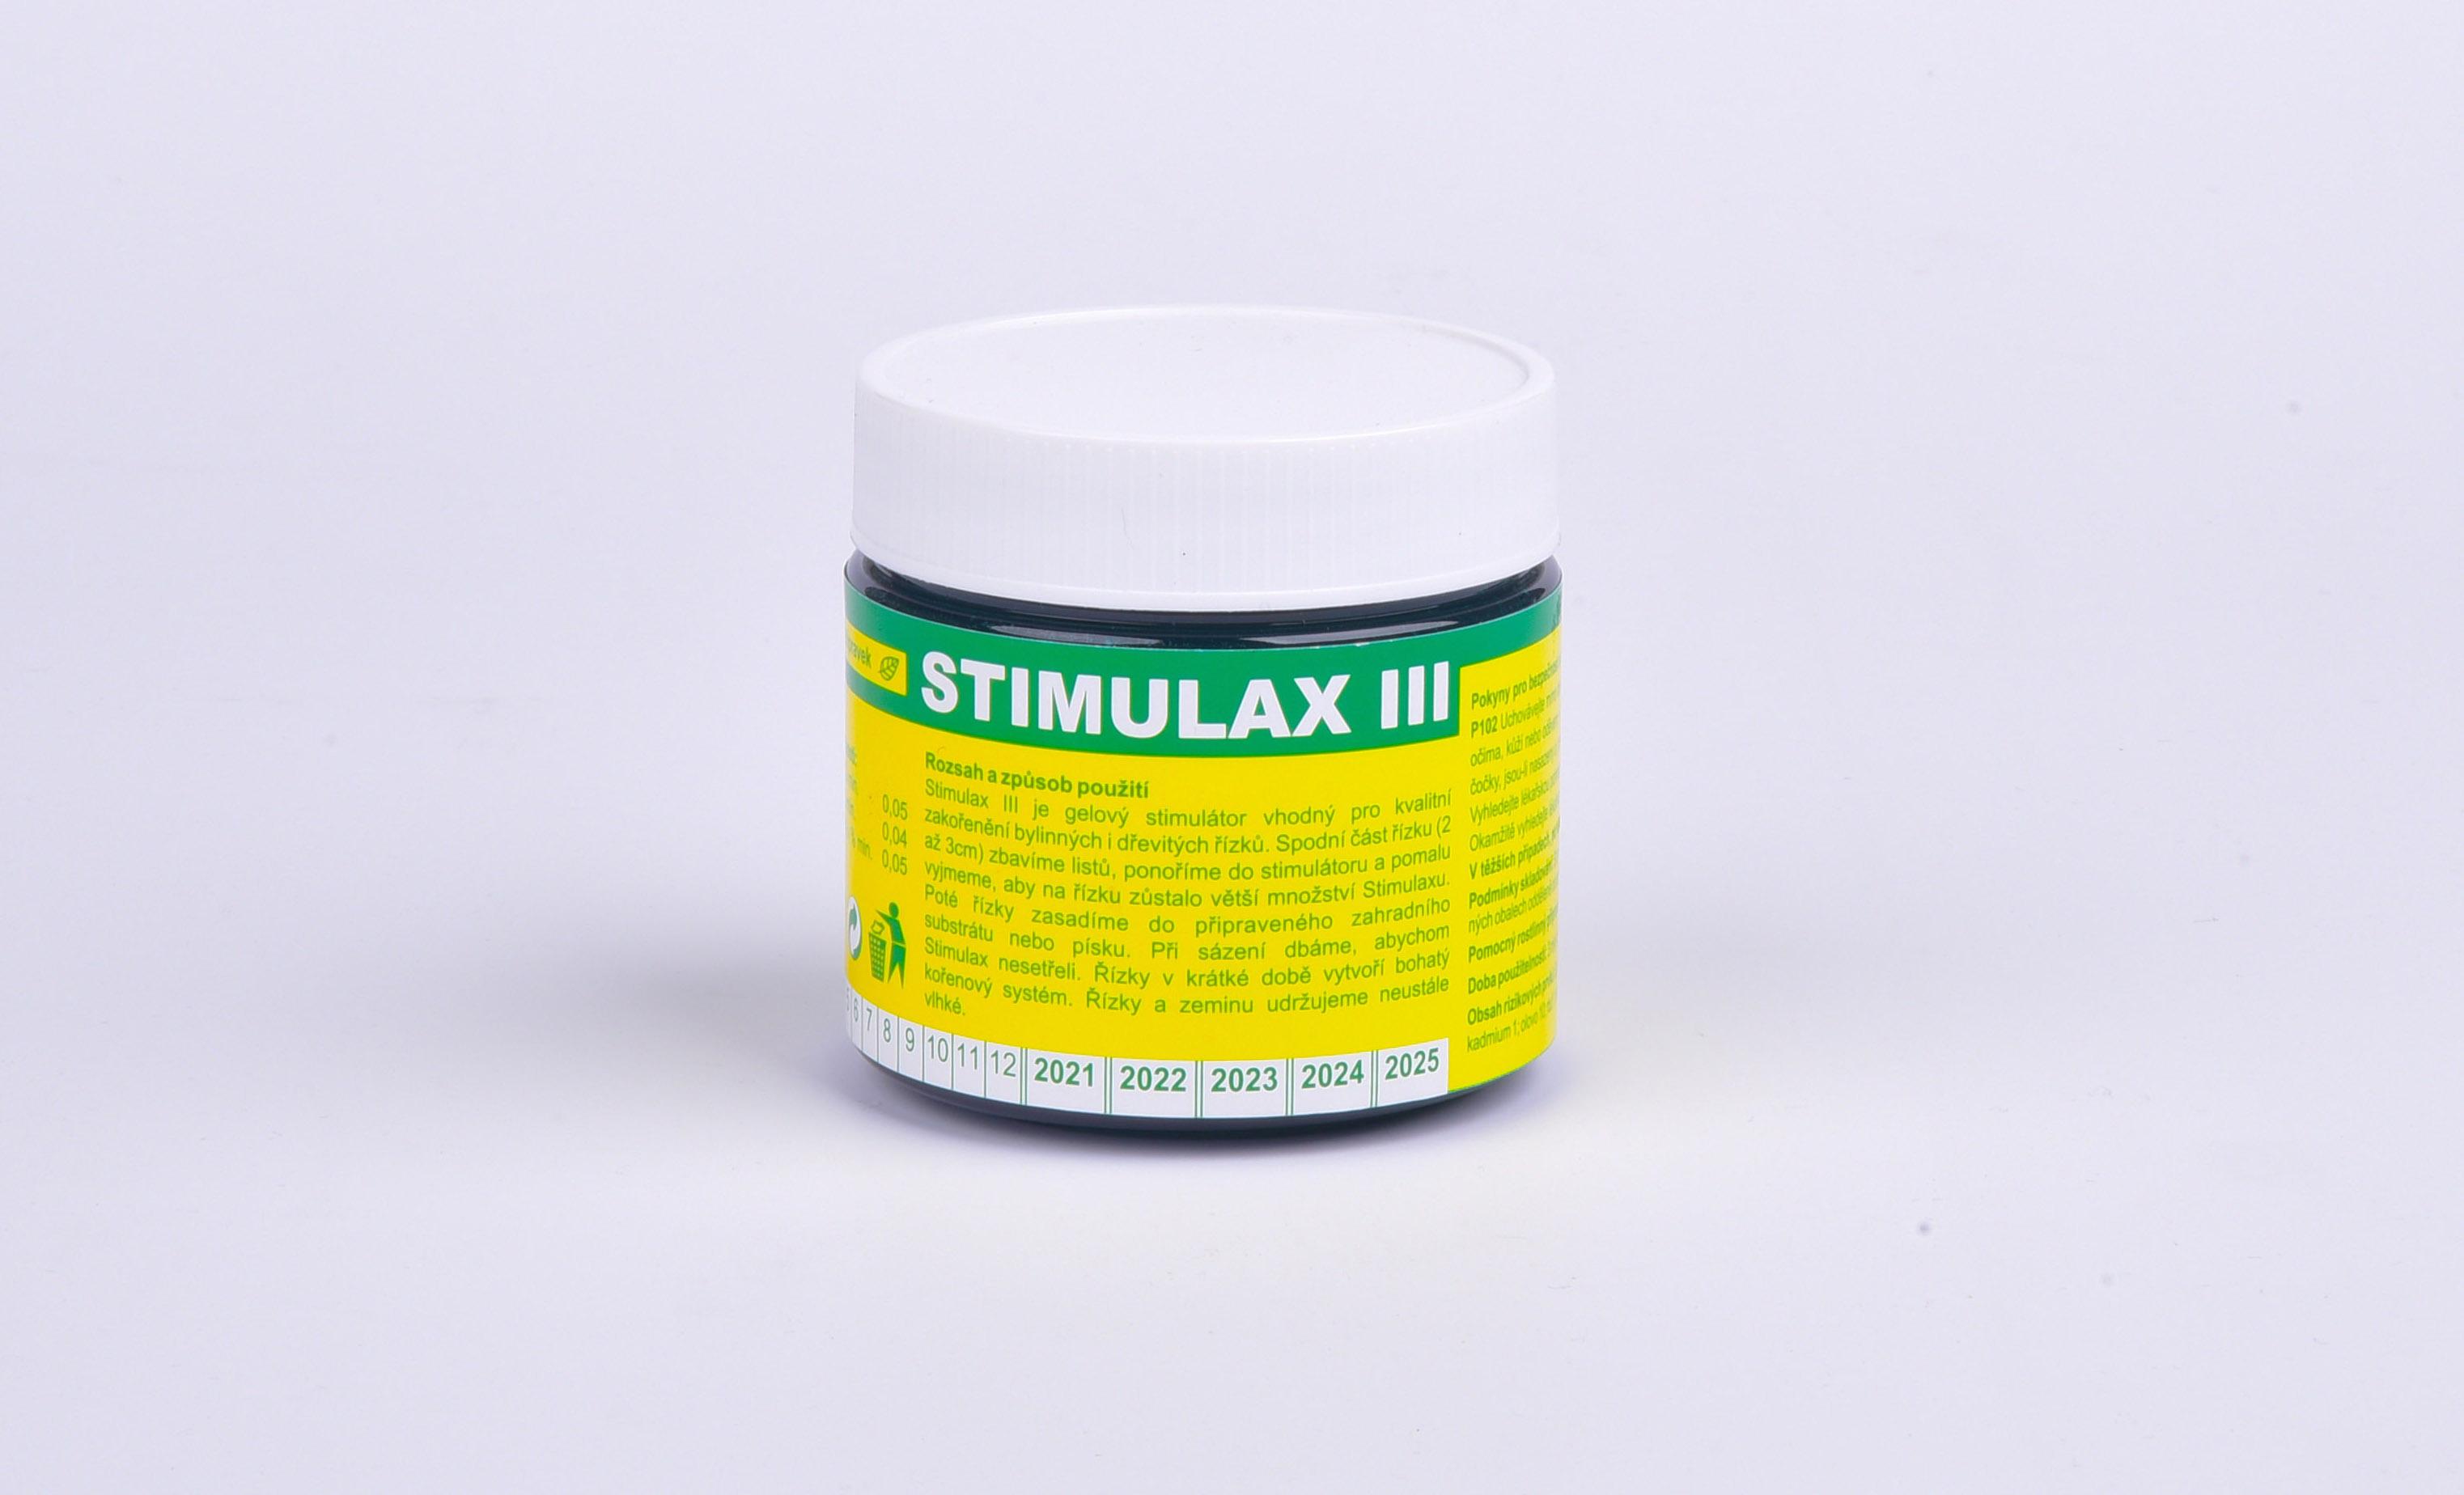 Stimulax 3-gelový